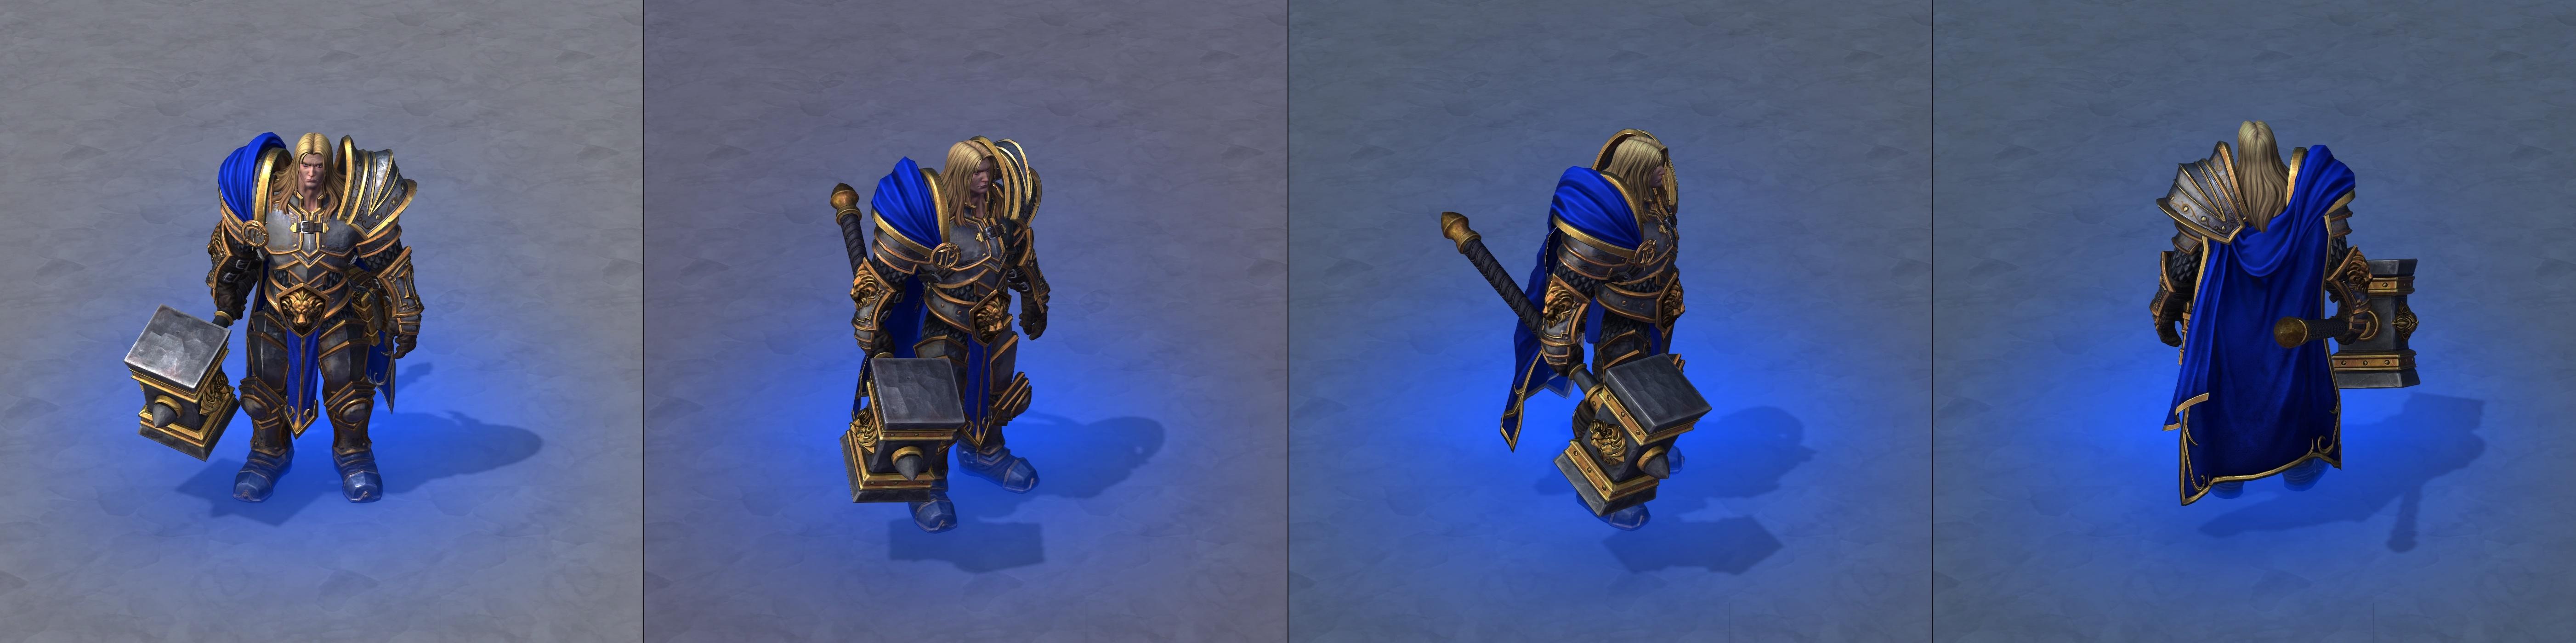 Warcraft III Reforged : Arthas